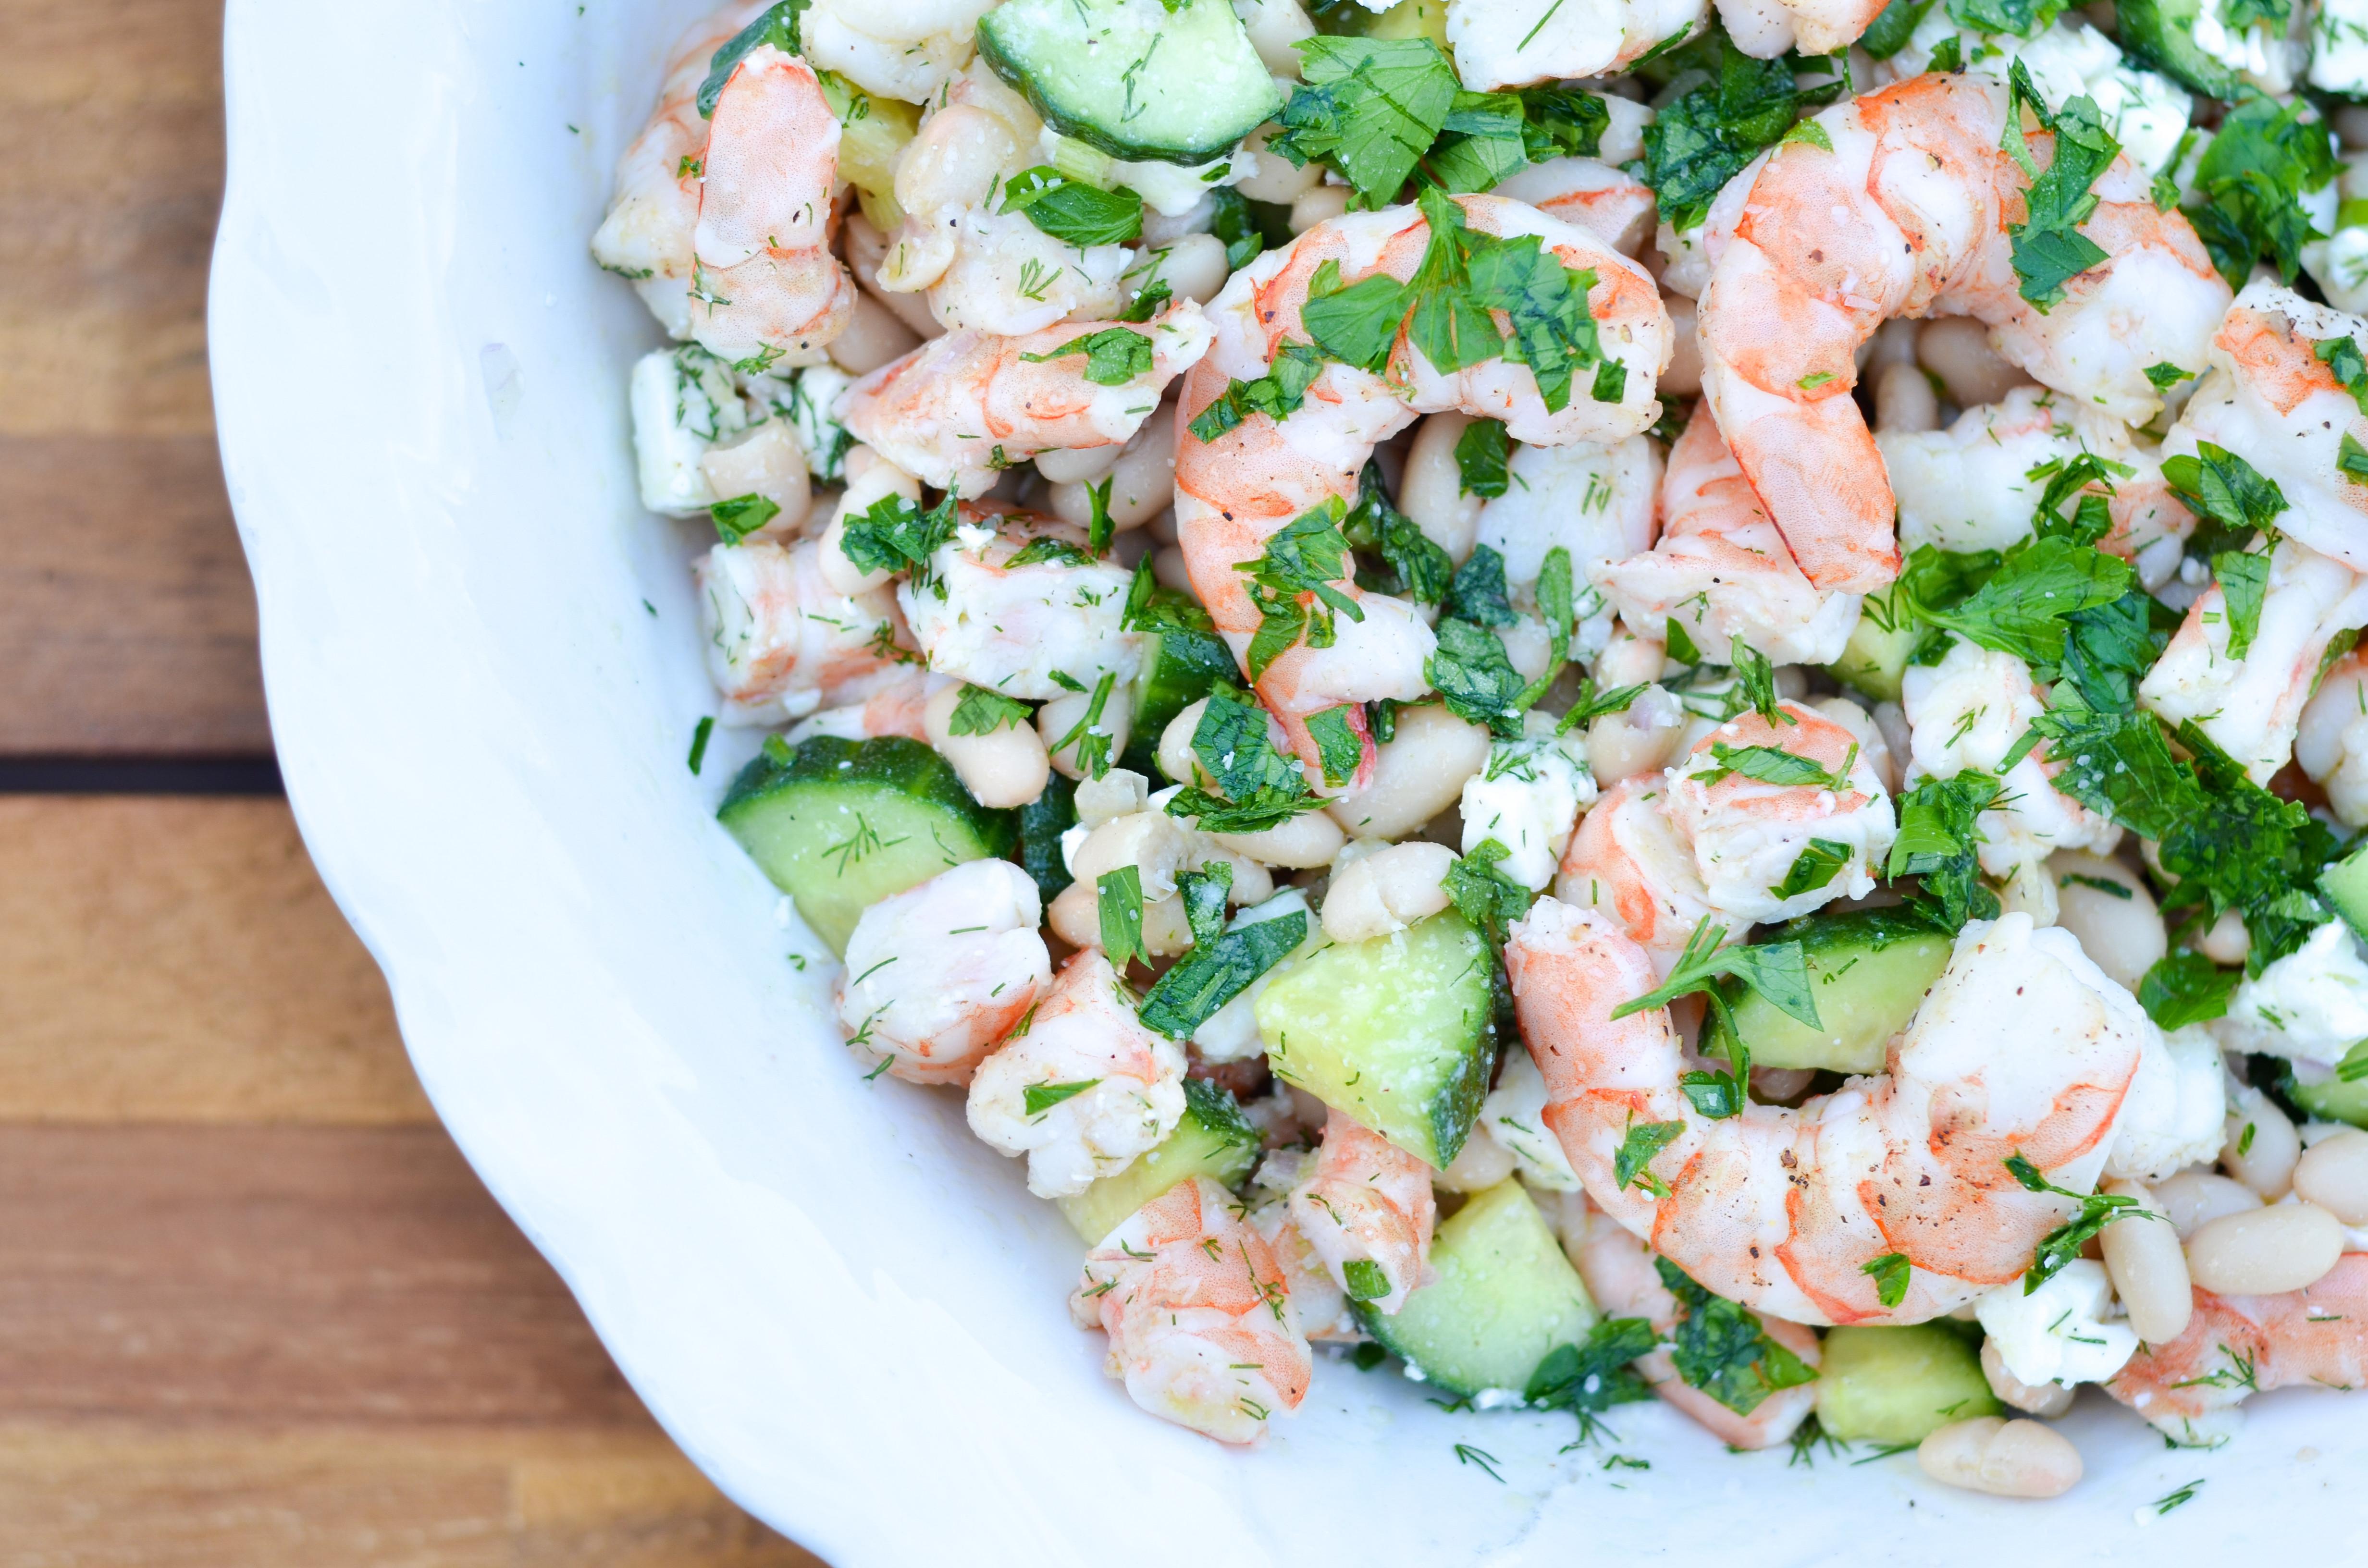 Summer Shrimp Salad  Cucumber Shrimp Salad Recipe The Chronicles of Home